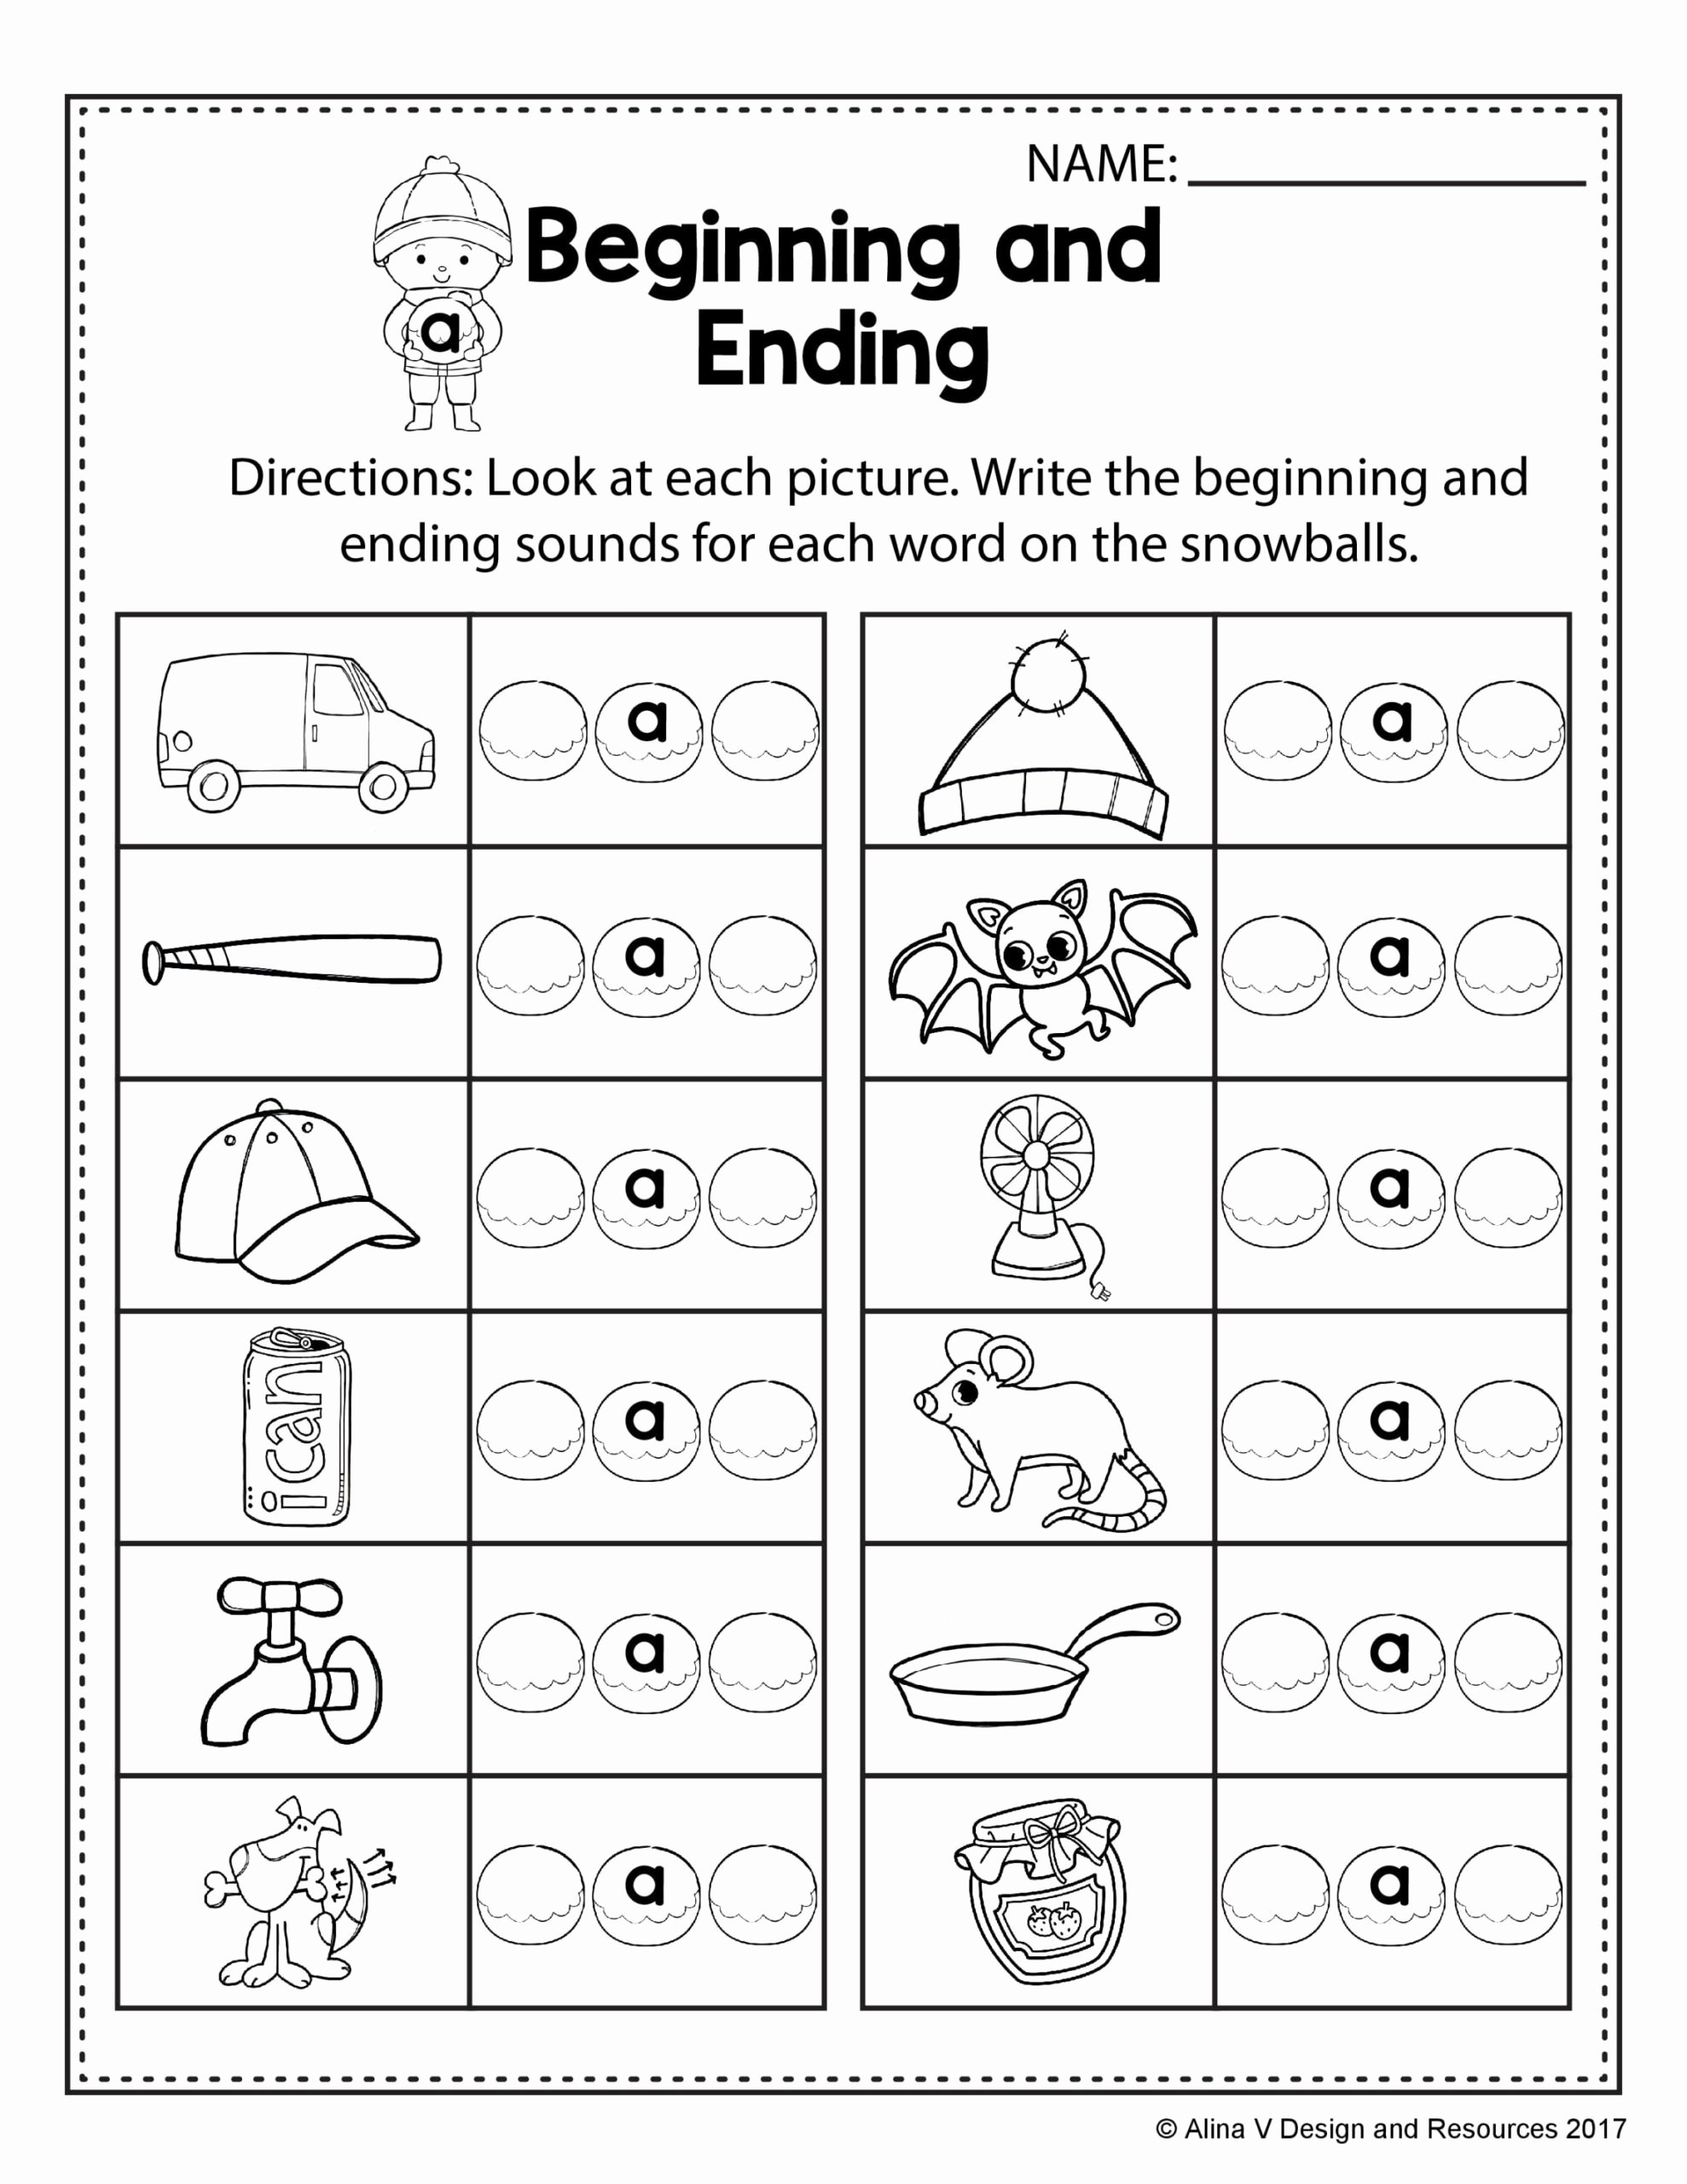 Rhyming Words Worksheets for Preschoolers Inspirational Free Winter Literacy Worksheet for Kindergarten No Prep